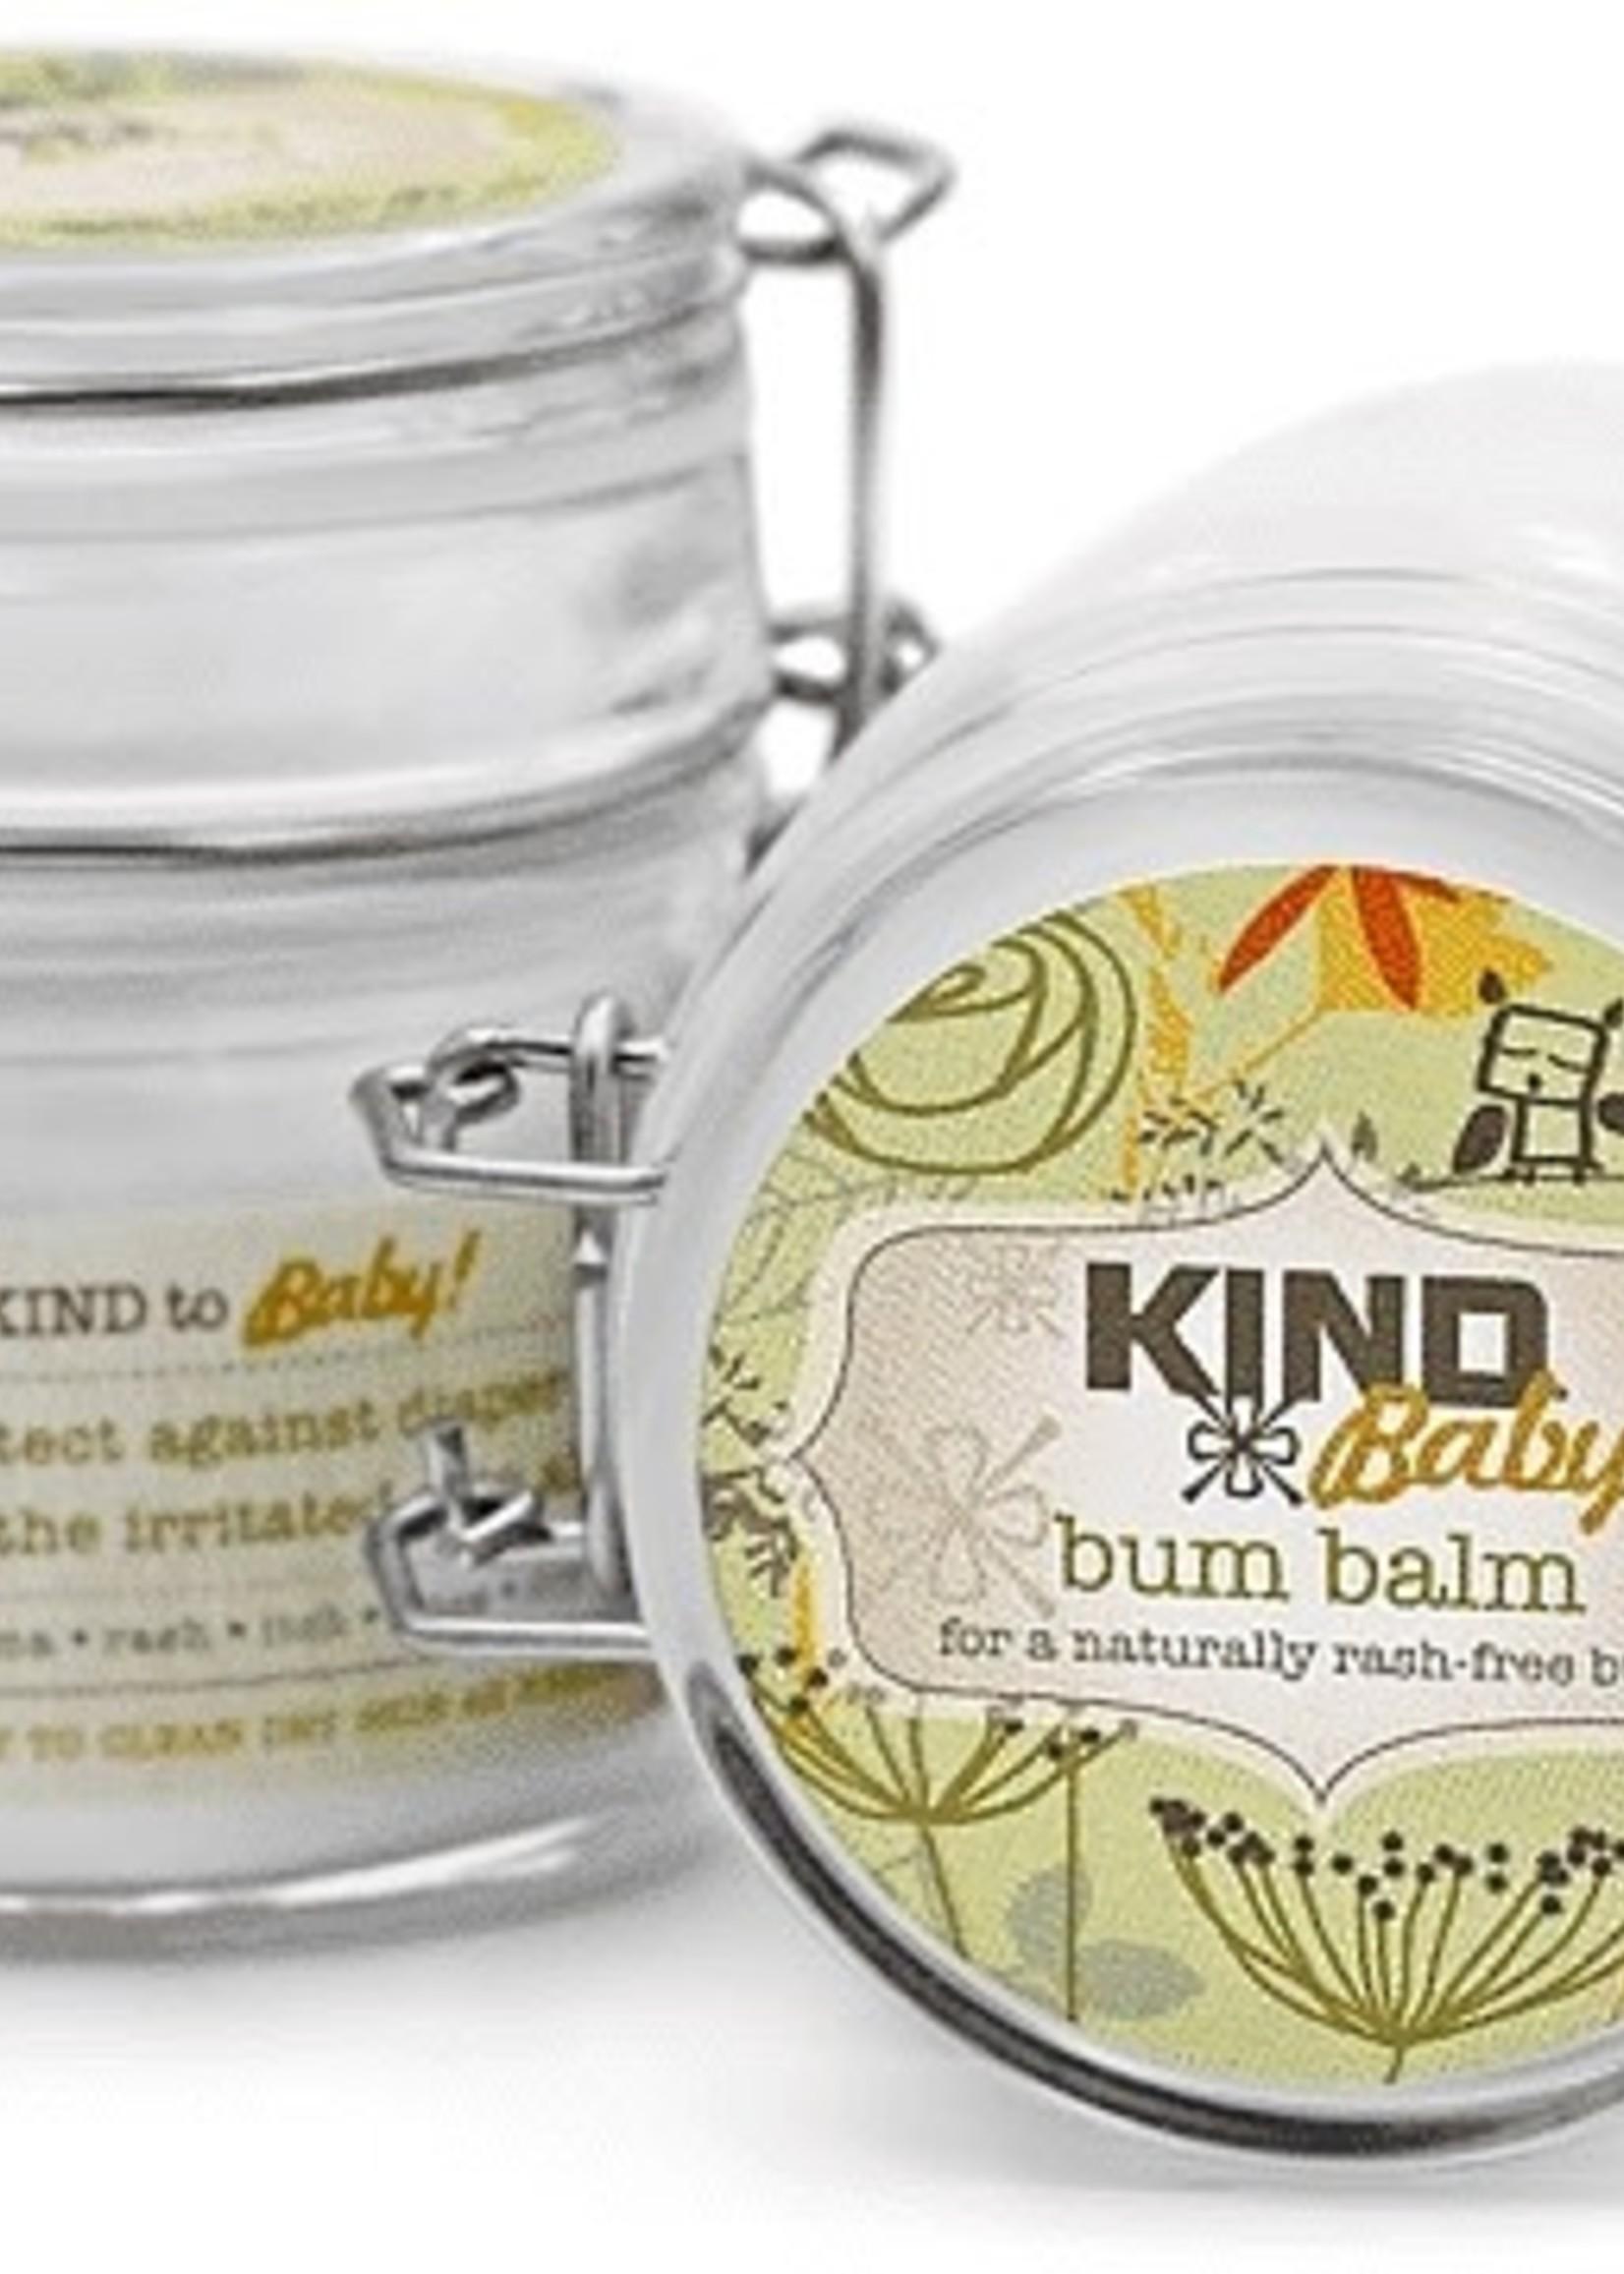 KIND Soap Co Baby Bum Balm